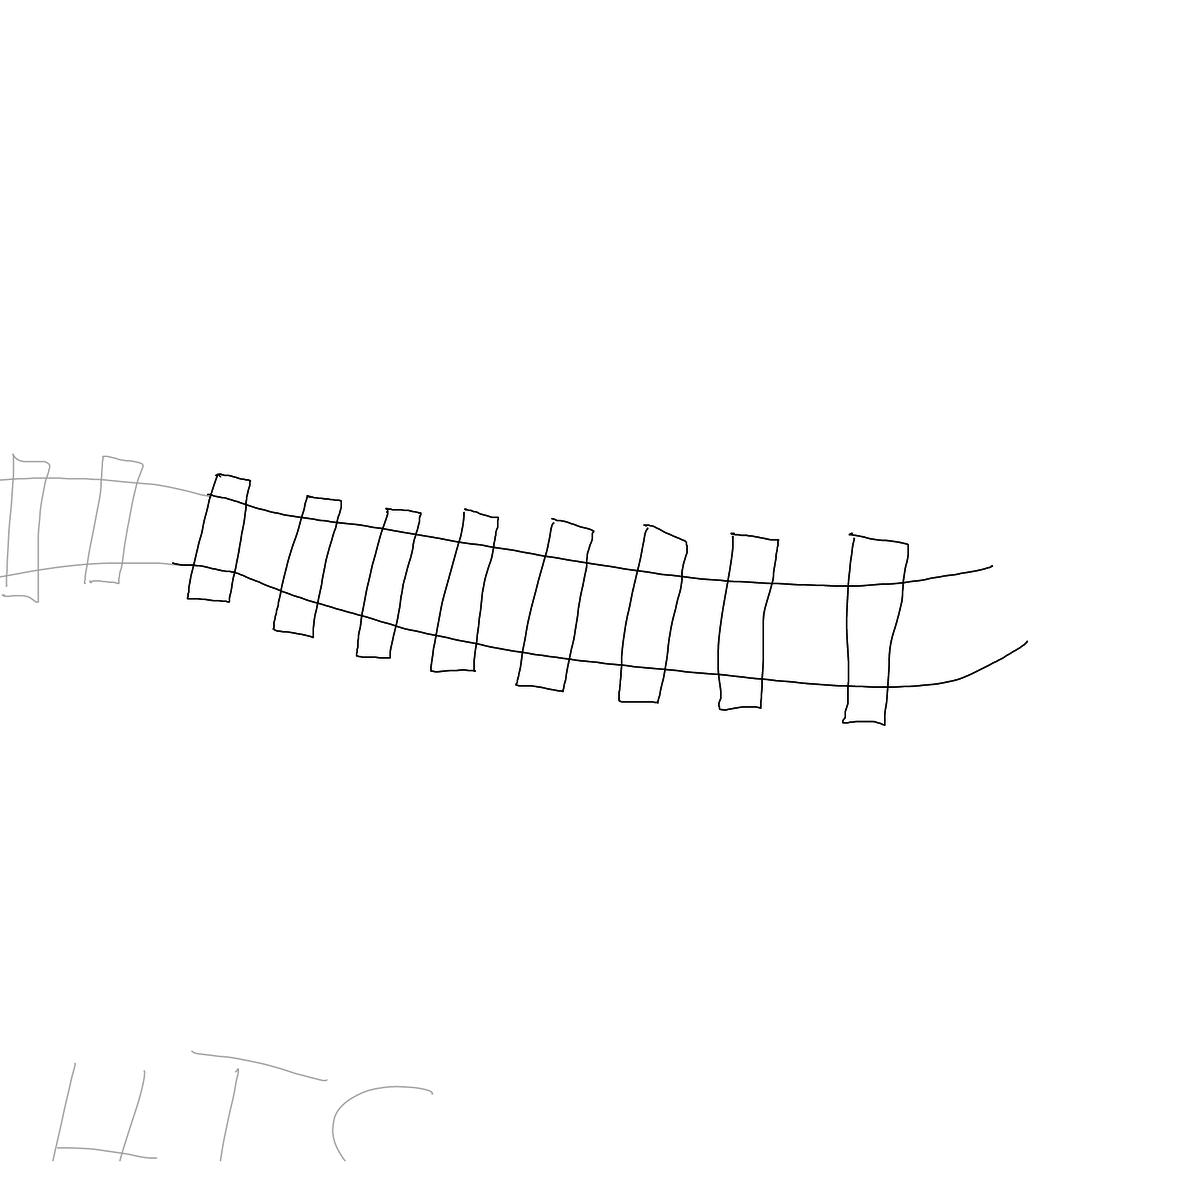 BAAAM drawing#21 lat:-26.5884933471679700lng: 134.8242492675781200